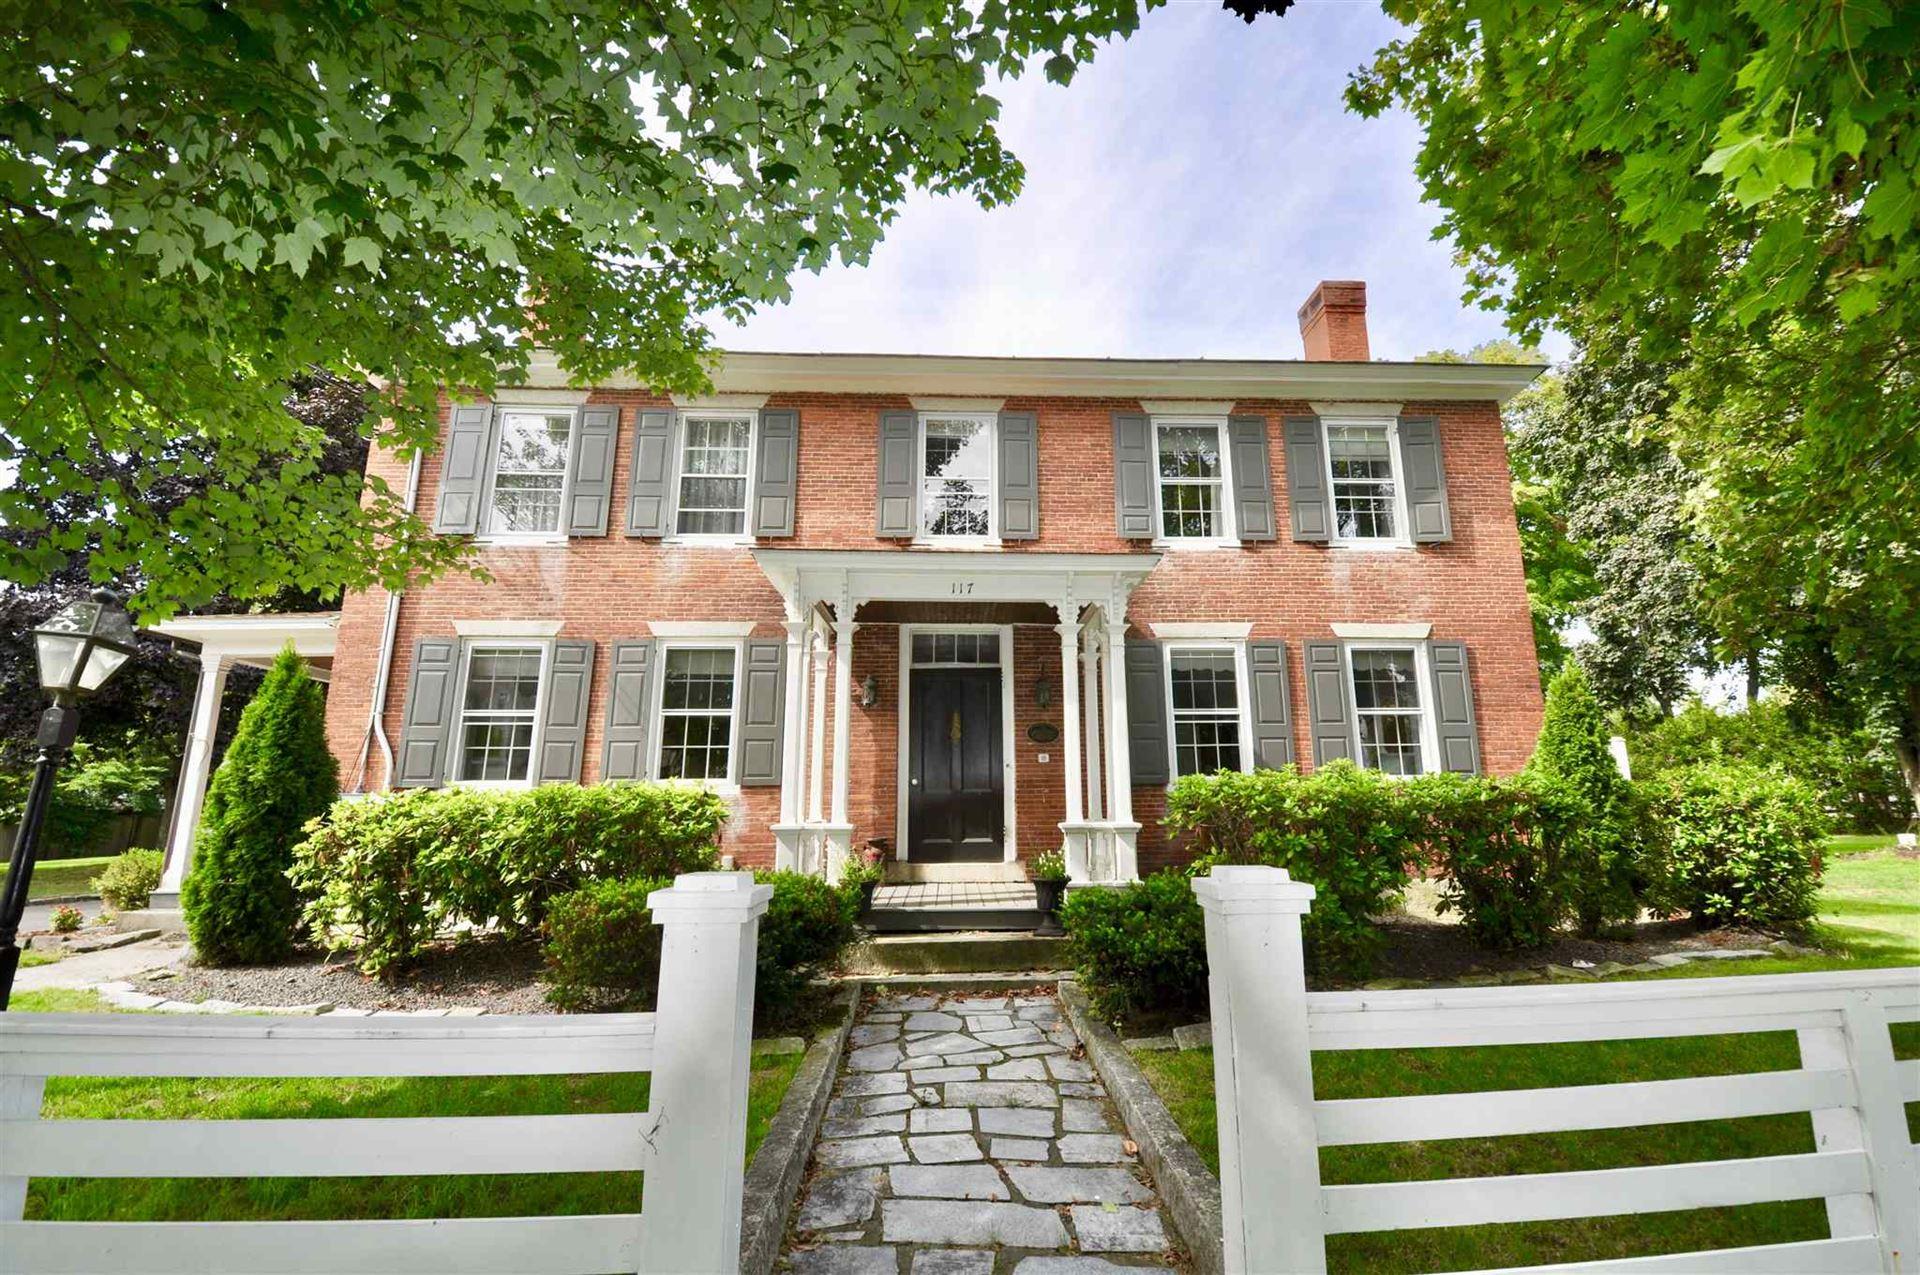 117 Boston Post Road, Amherst, NH 03031 - MLS#: 4826262